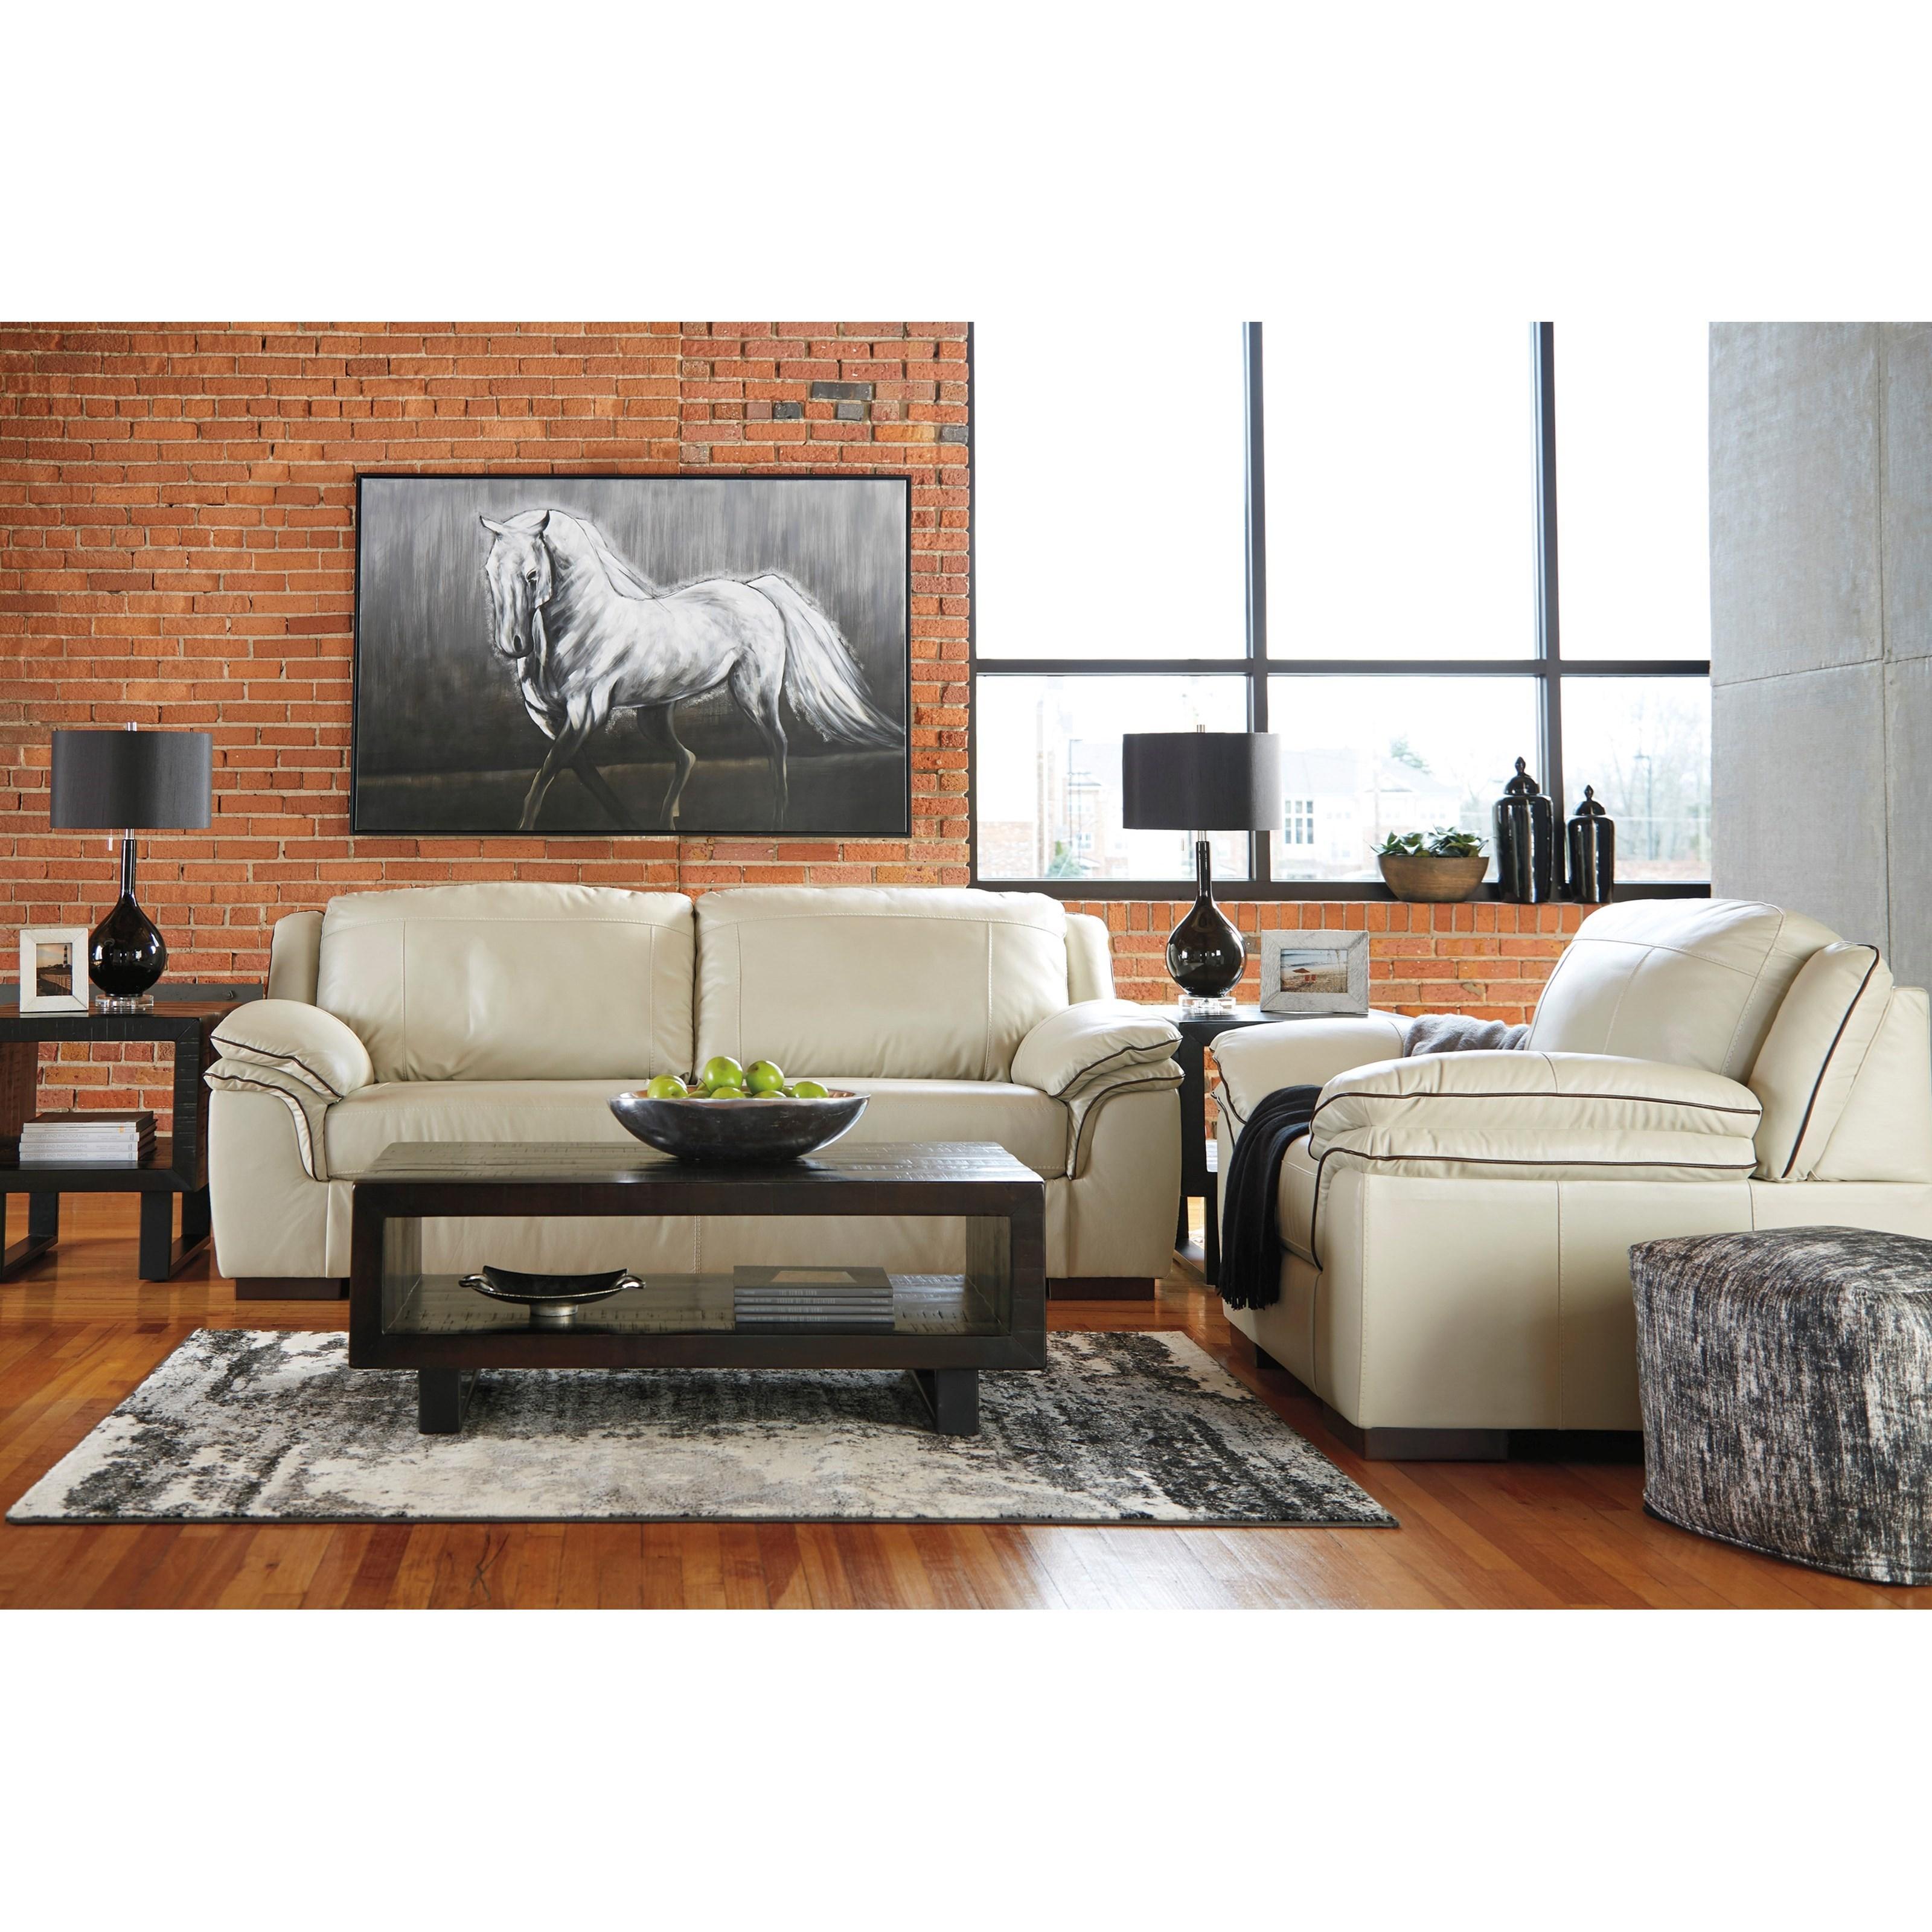 Signature Design By Ashley Islebrook Stationary Living Room Group Olinde 39 S Furniture